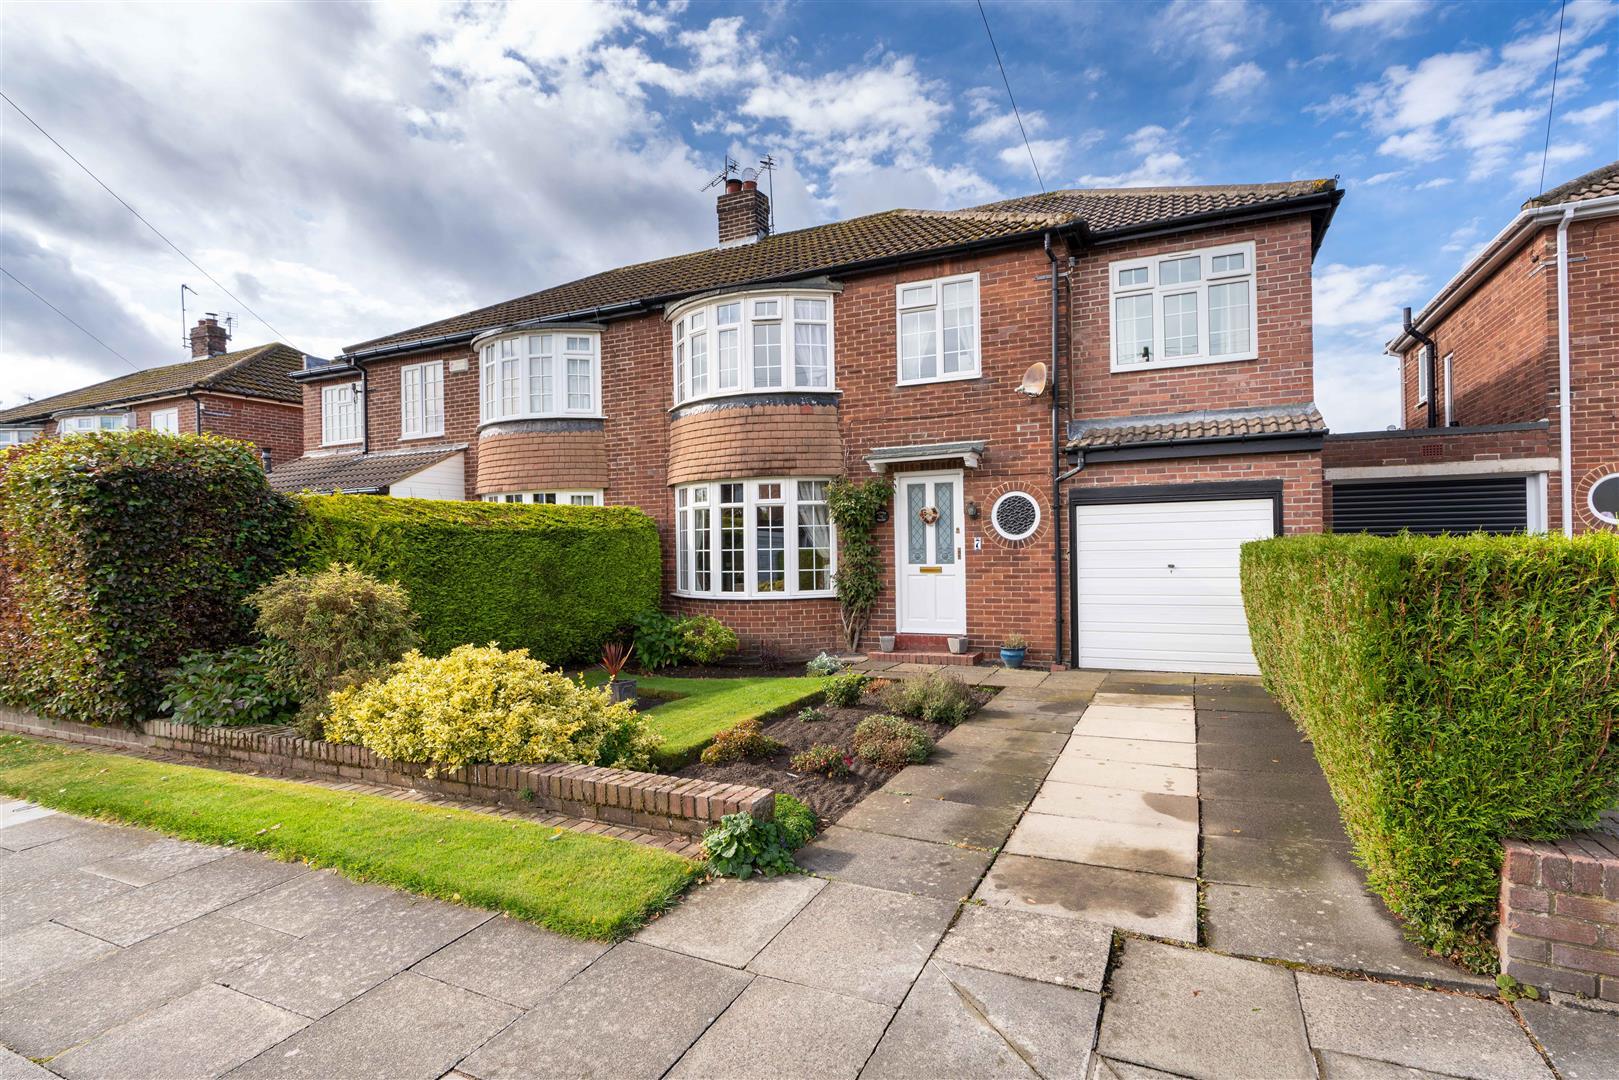 3 bed semi-detached house for sale in Beverley Close, Brunton Park, NE3